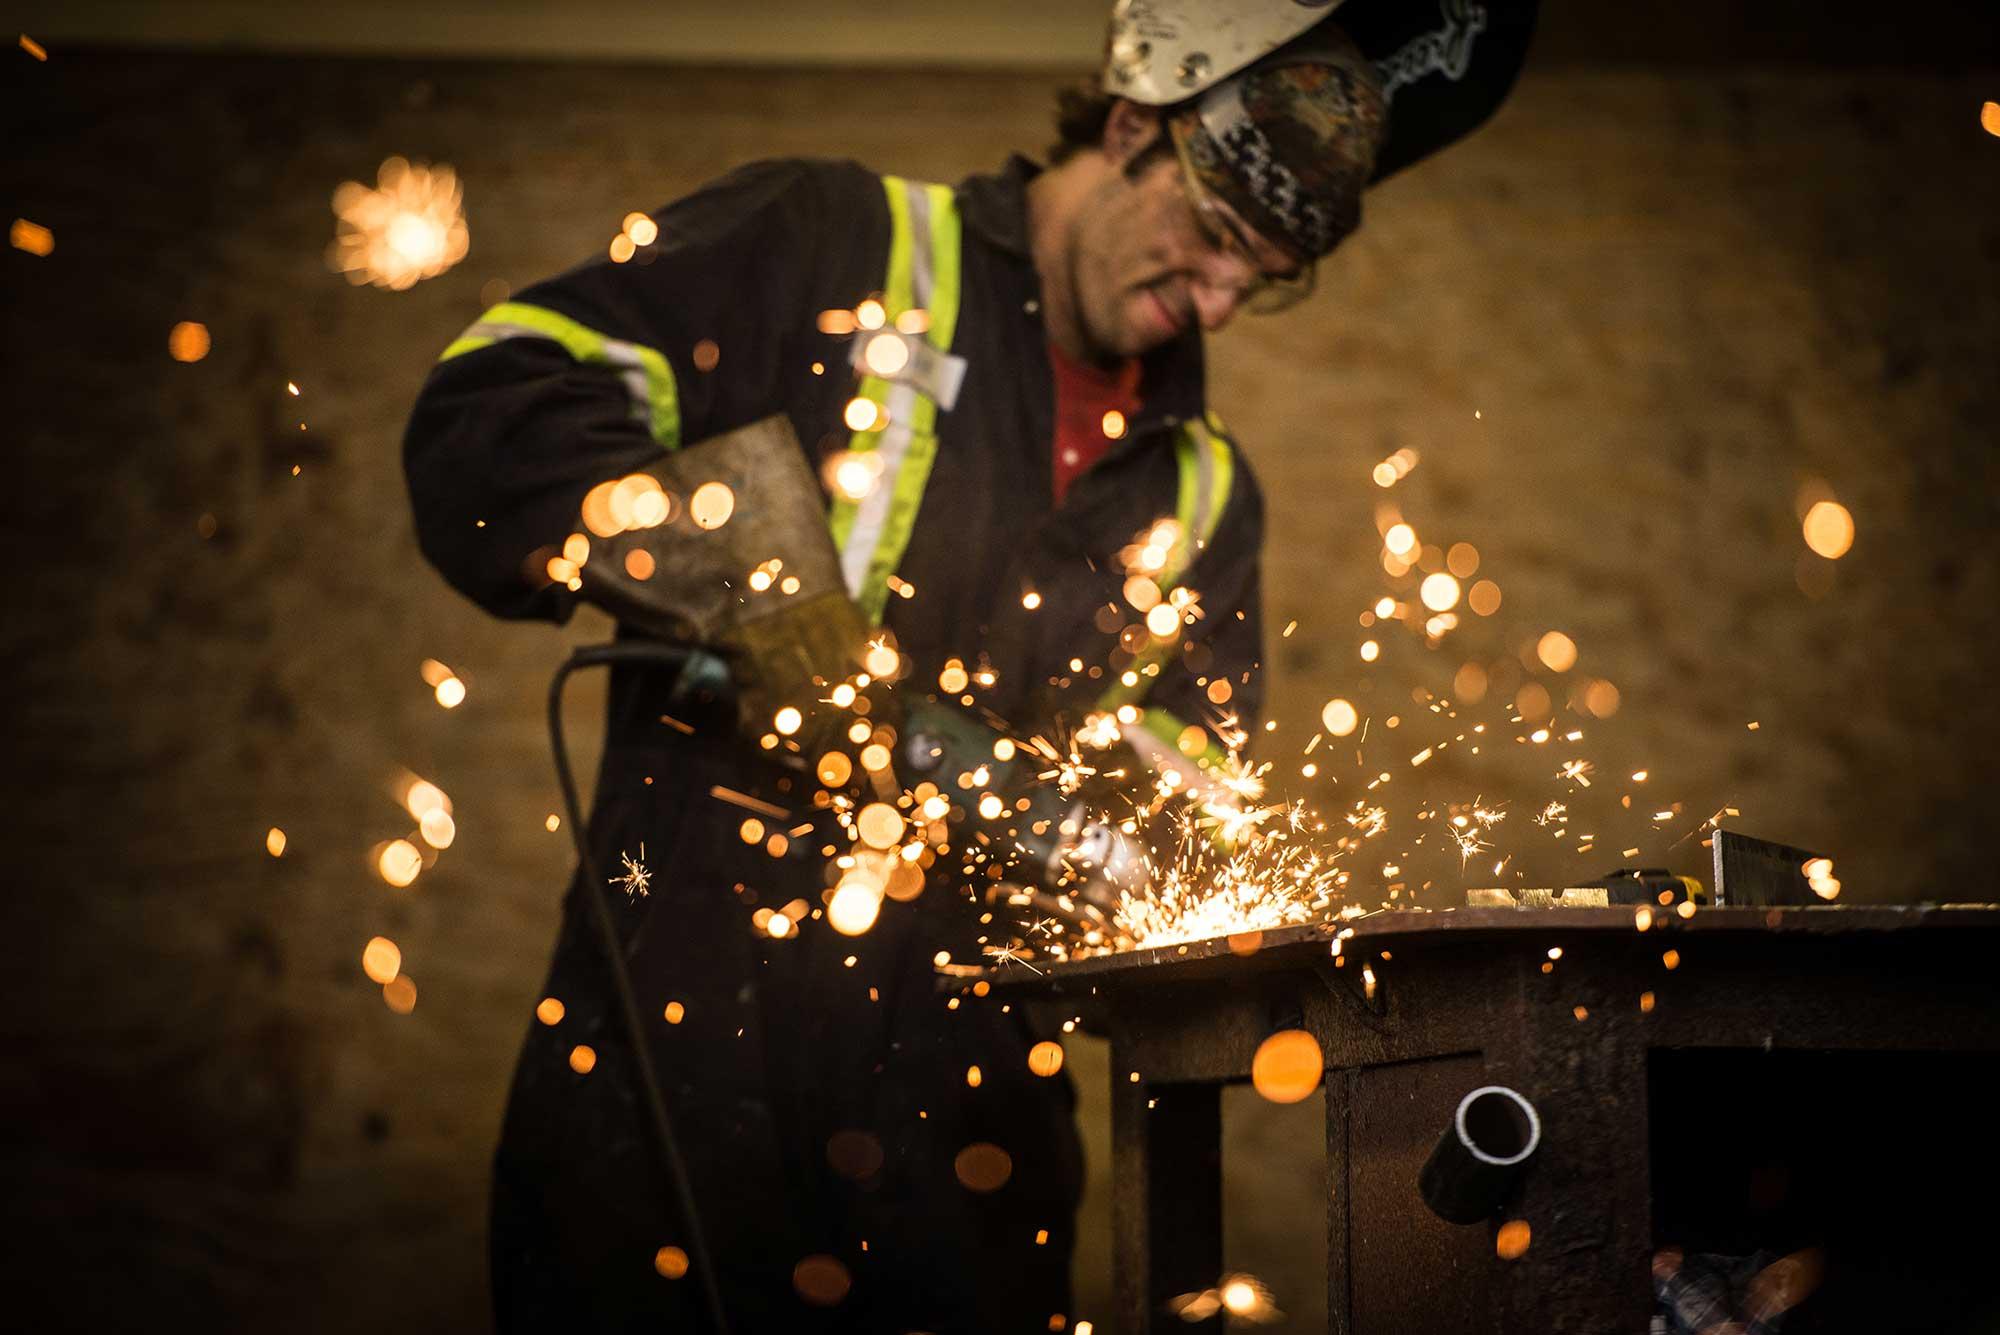 worker-welding-fabricating